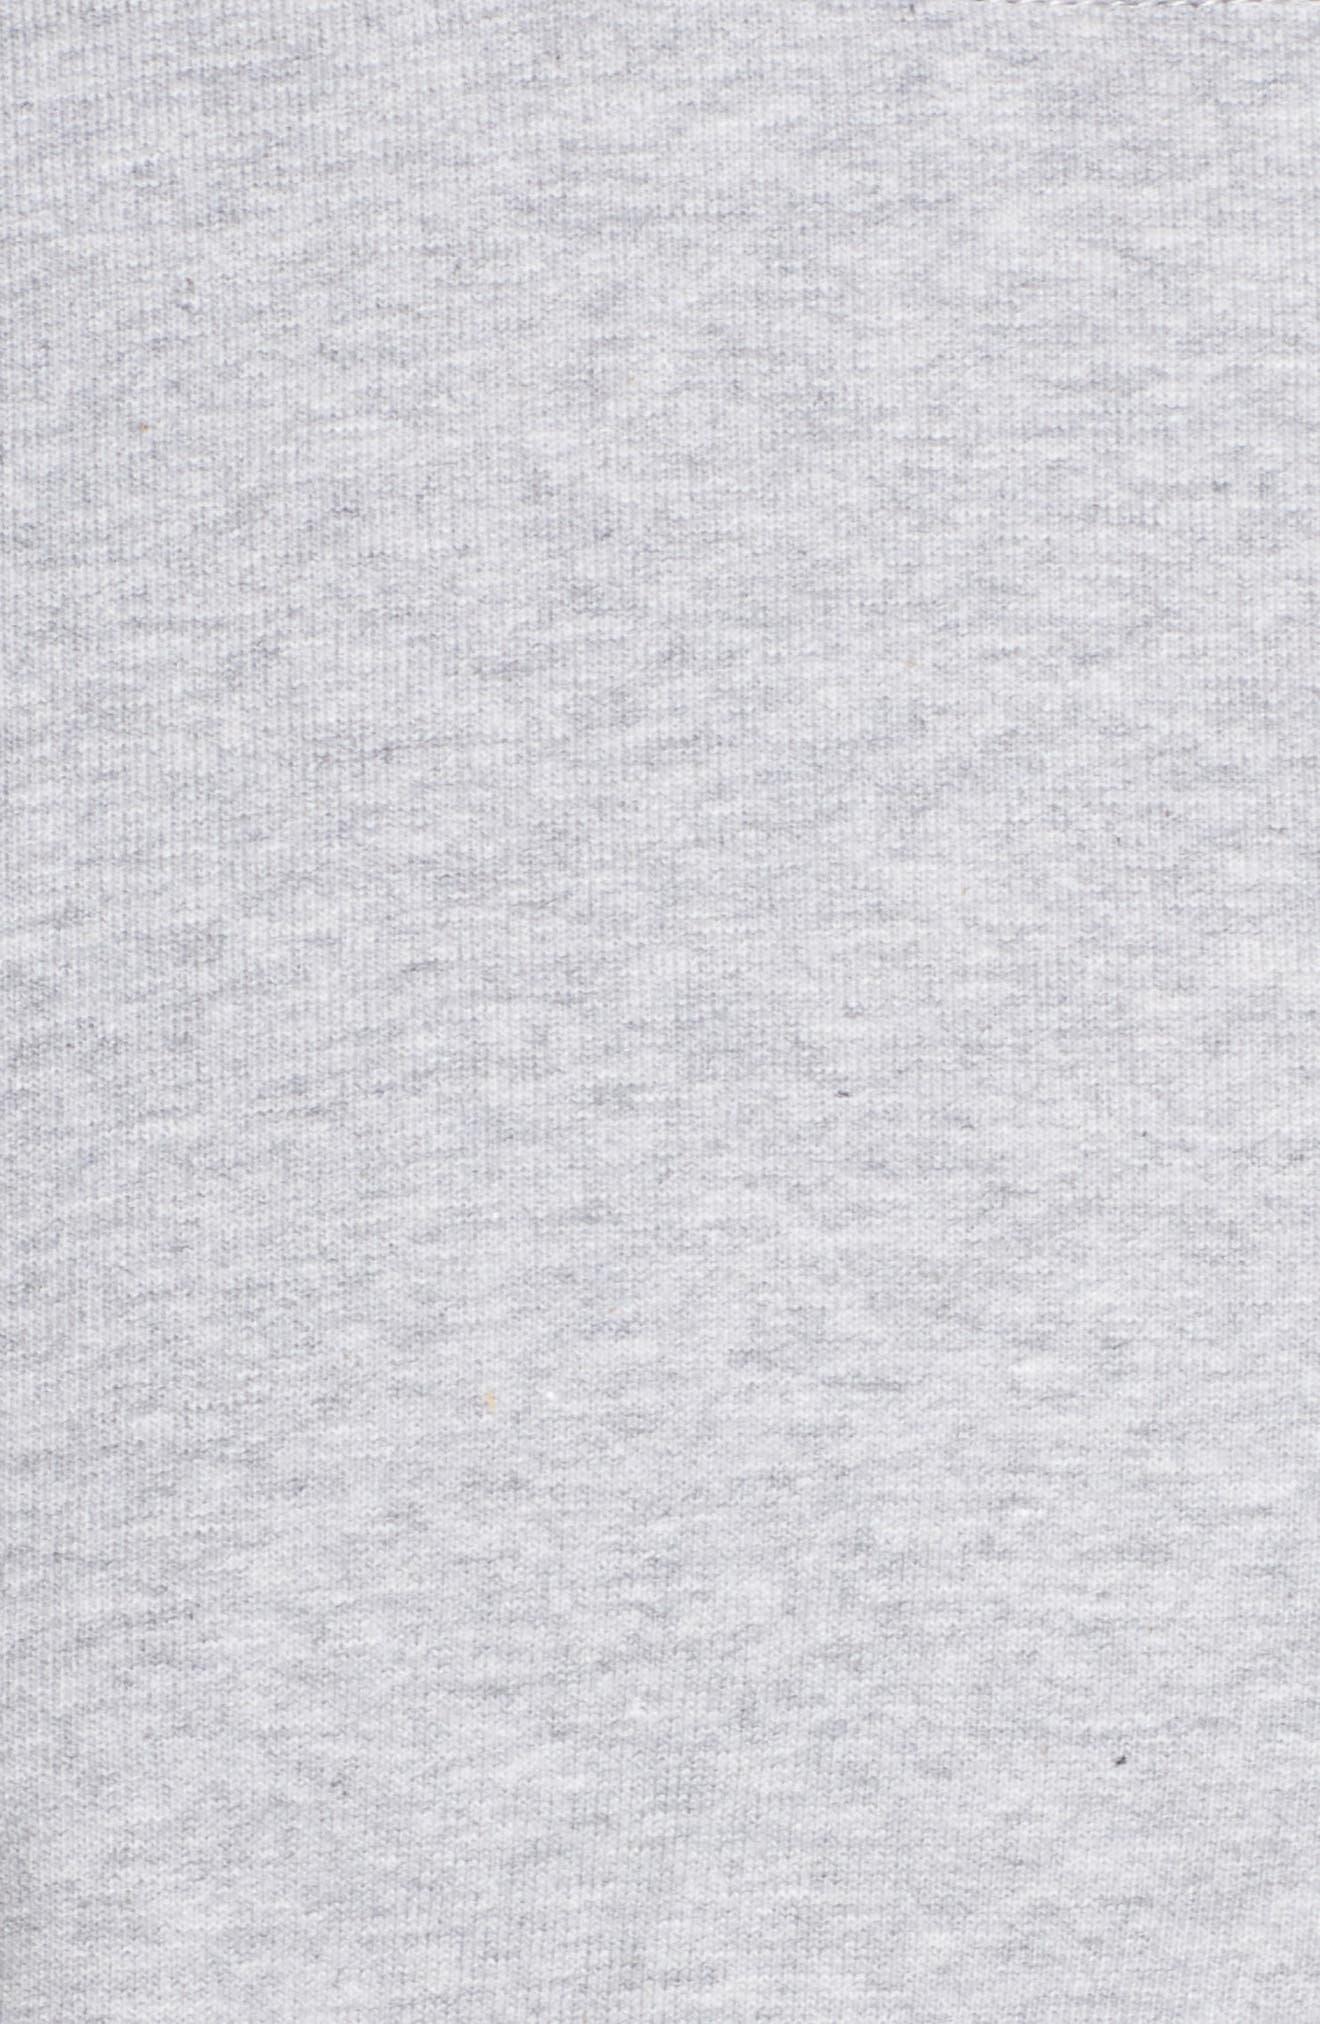 French Terry Crop Sweatshirt,                             Alternate thumbnail 7, color,                             Light Grey Marl